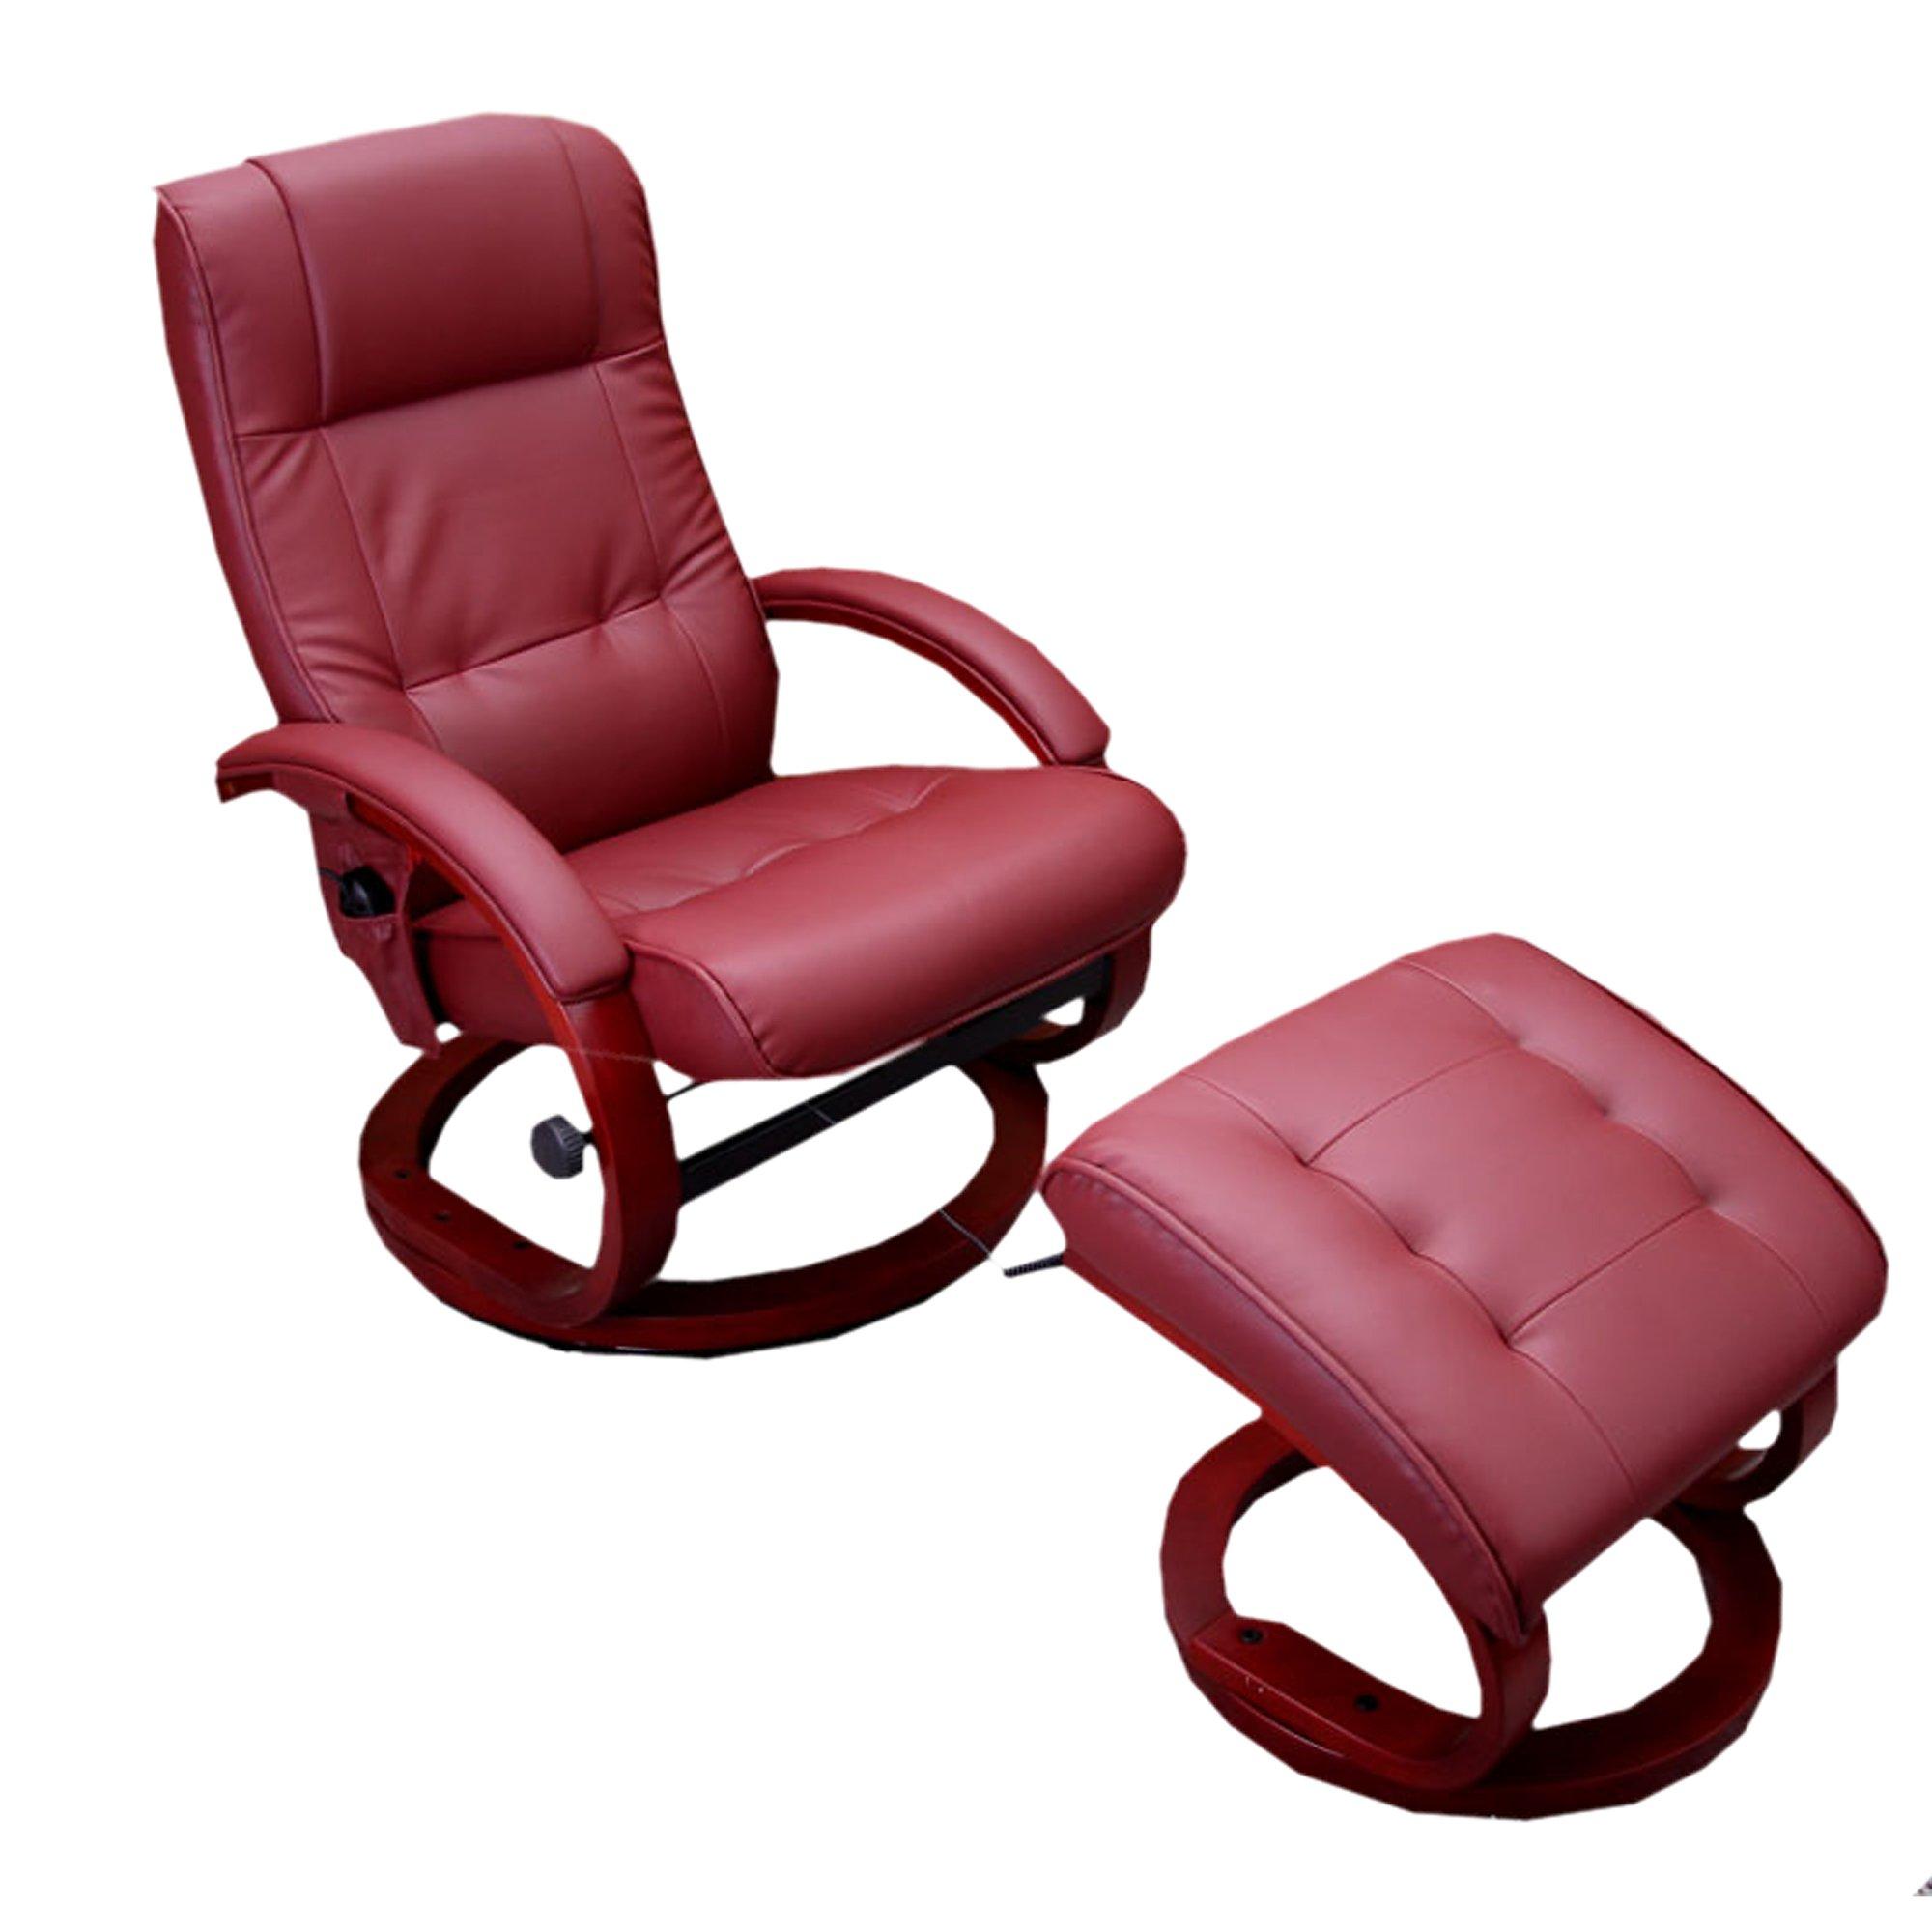 Sill n relax reclinable pescatori ii en piel rojo burdeos - Sillon reclinable piel ...